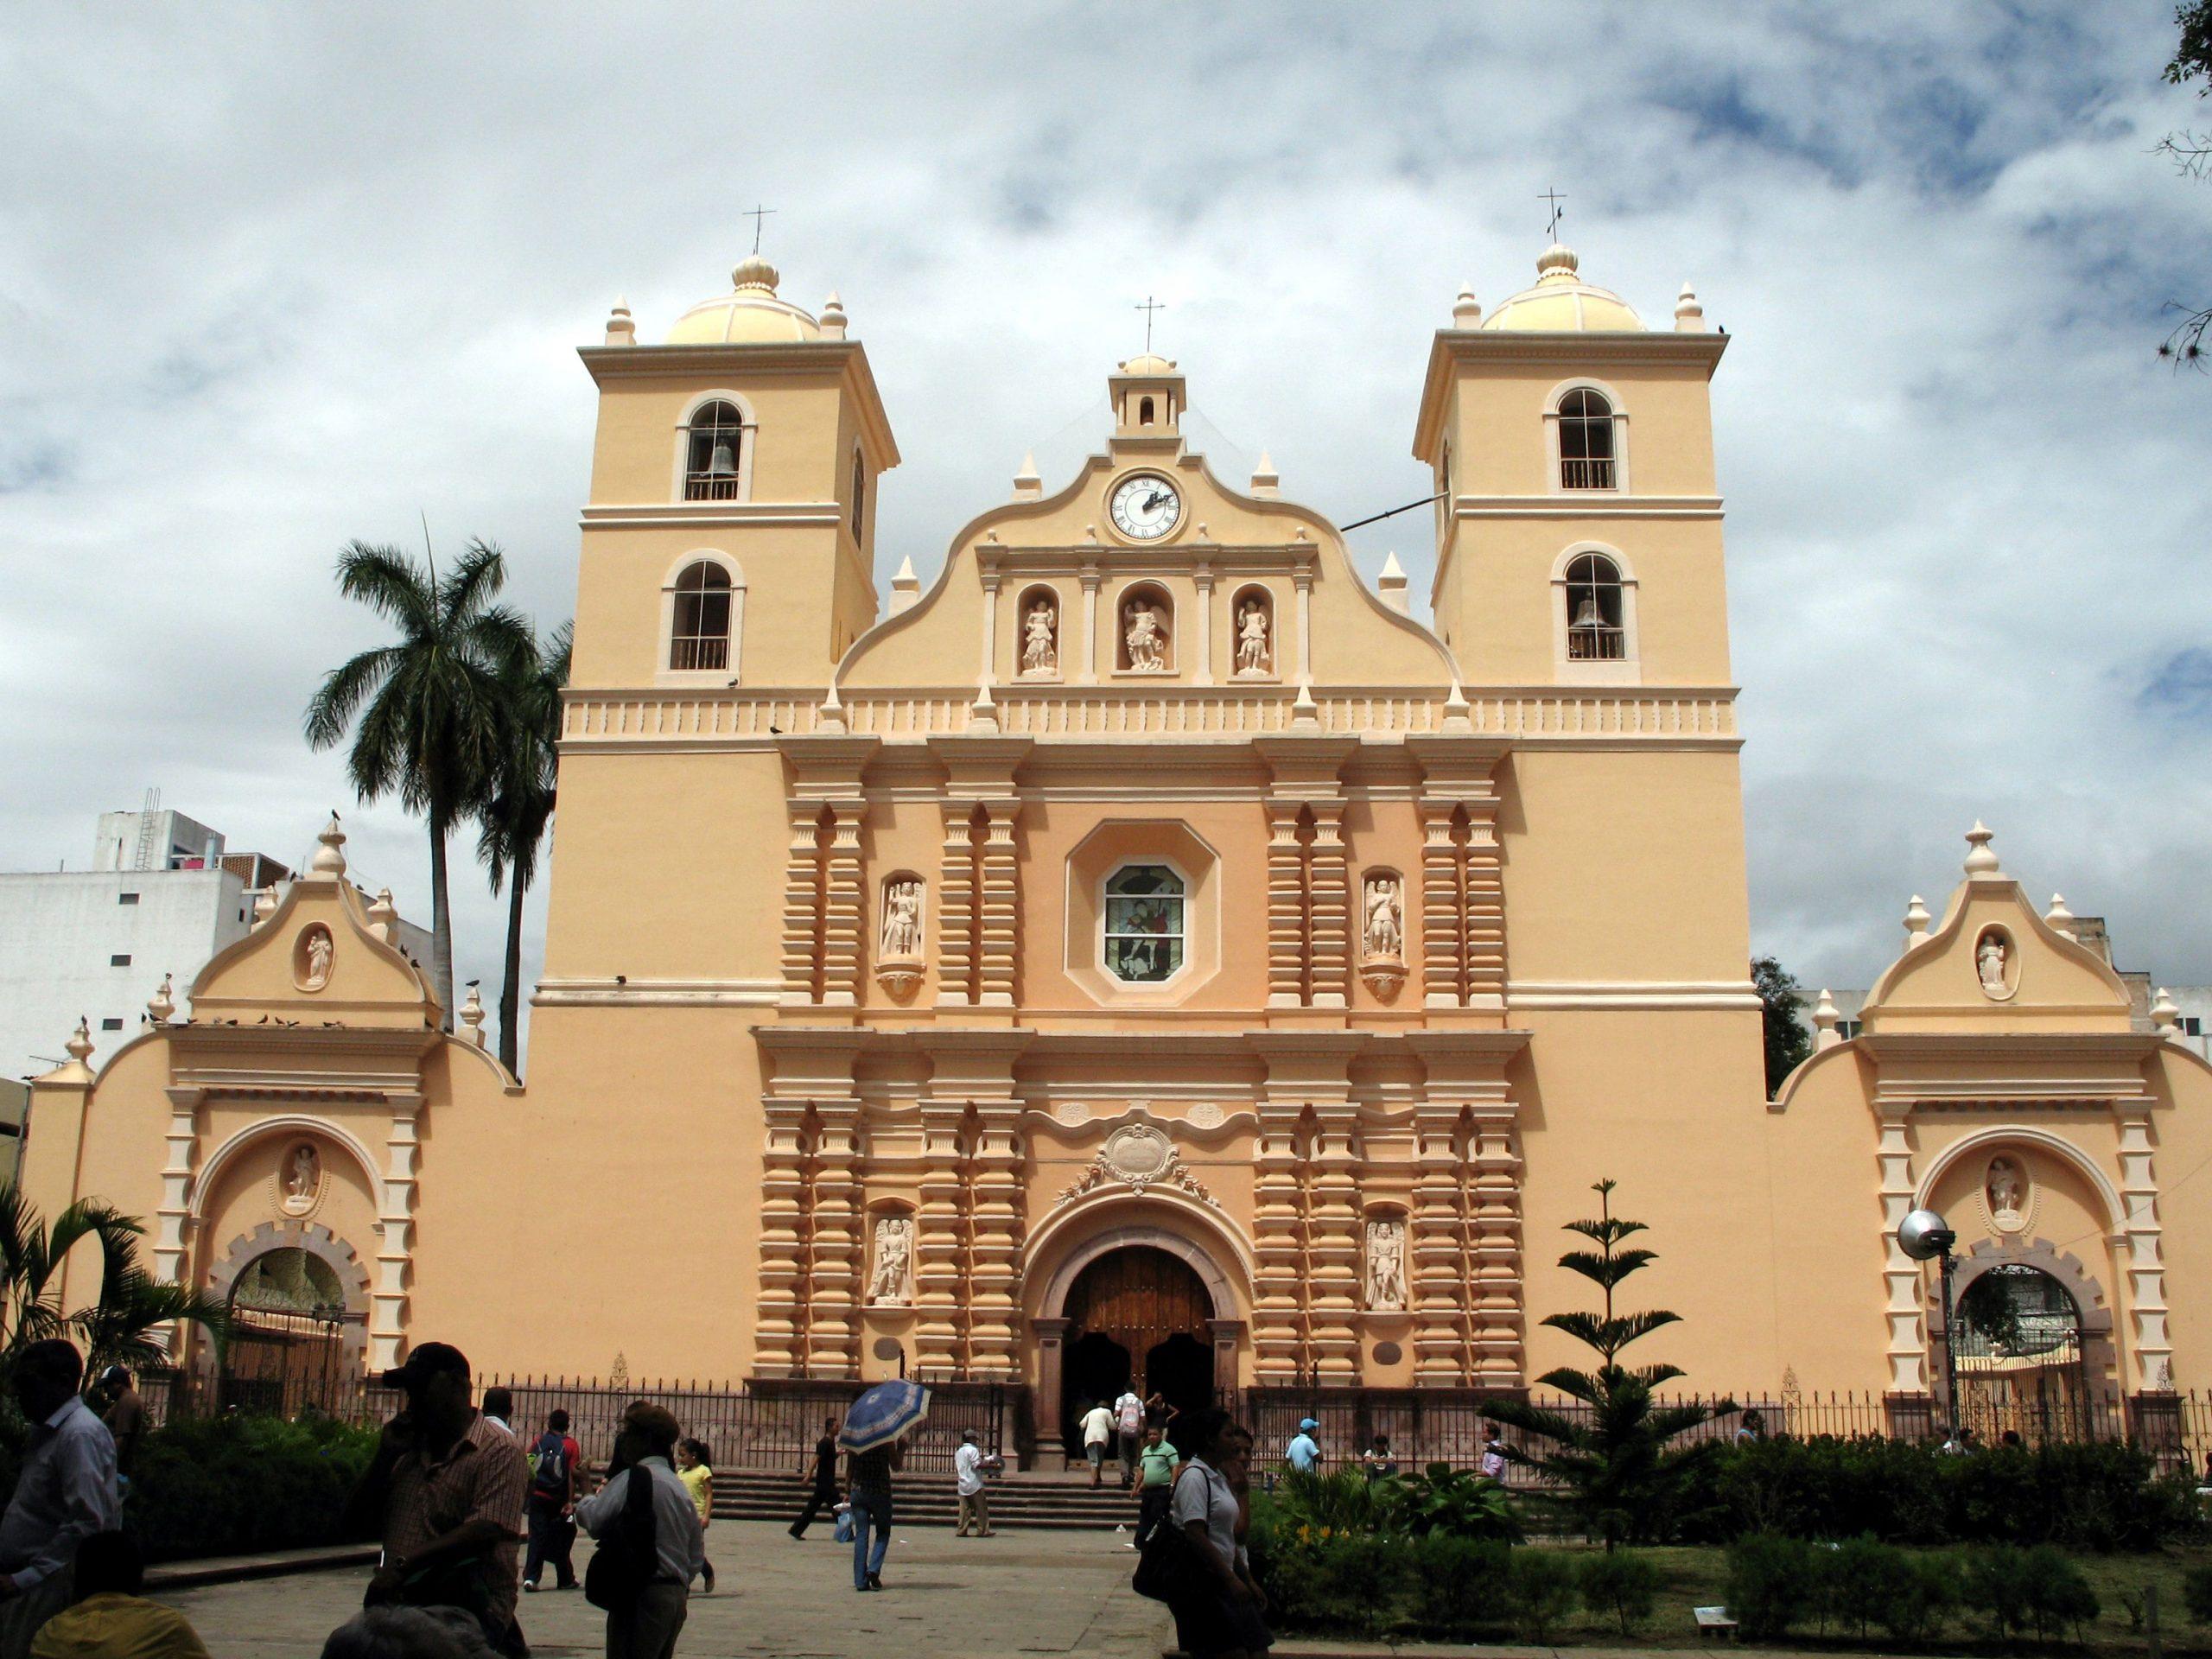 La Catedral de San Miguel Arcángel de Tegucigalpa